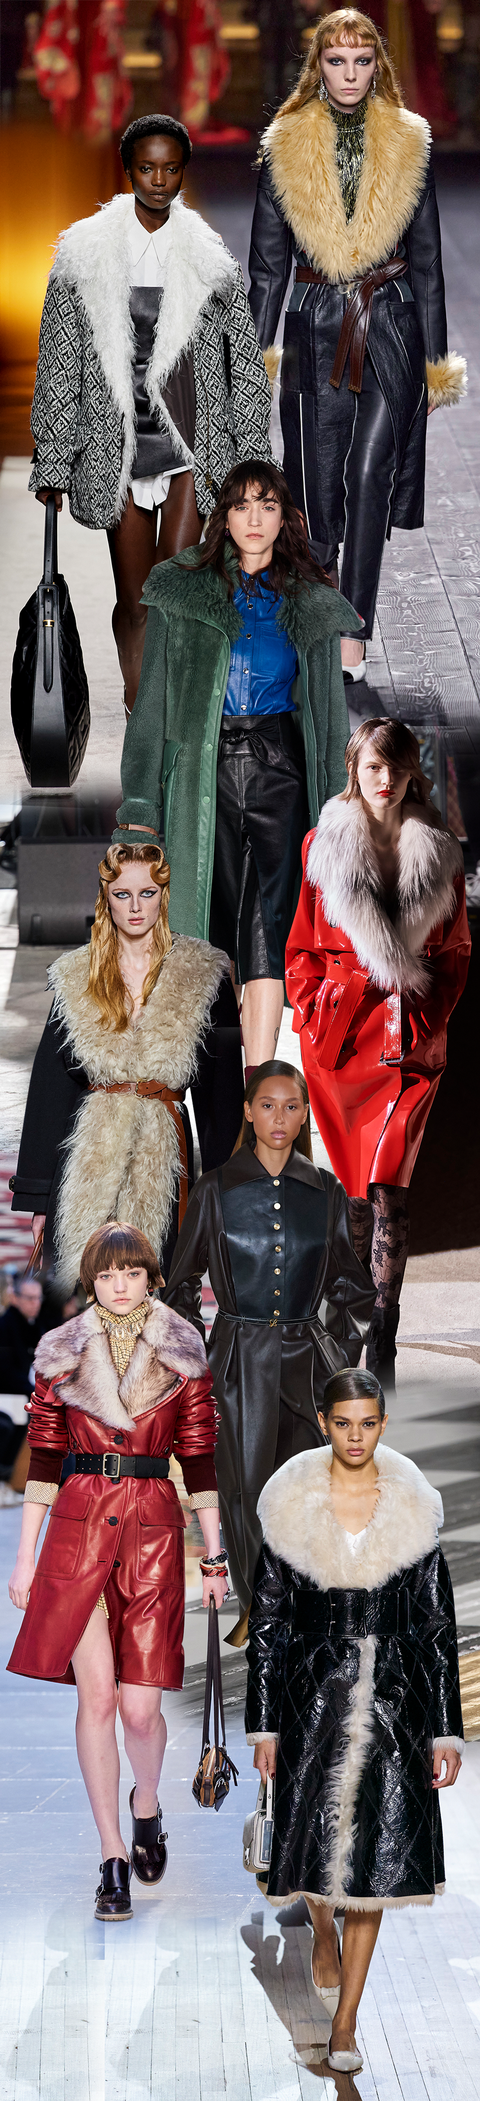 Fashion, Fur clothing, Fur, Fashion model, Clothing, Haute couture, Outerwear, Textile, Model, Runway,